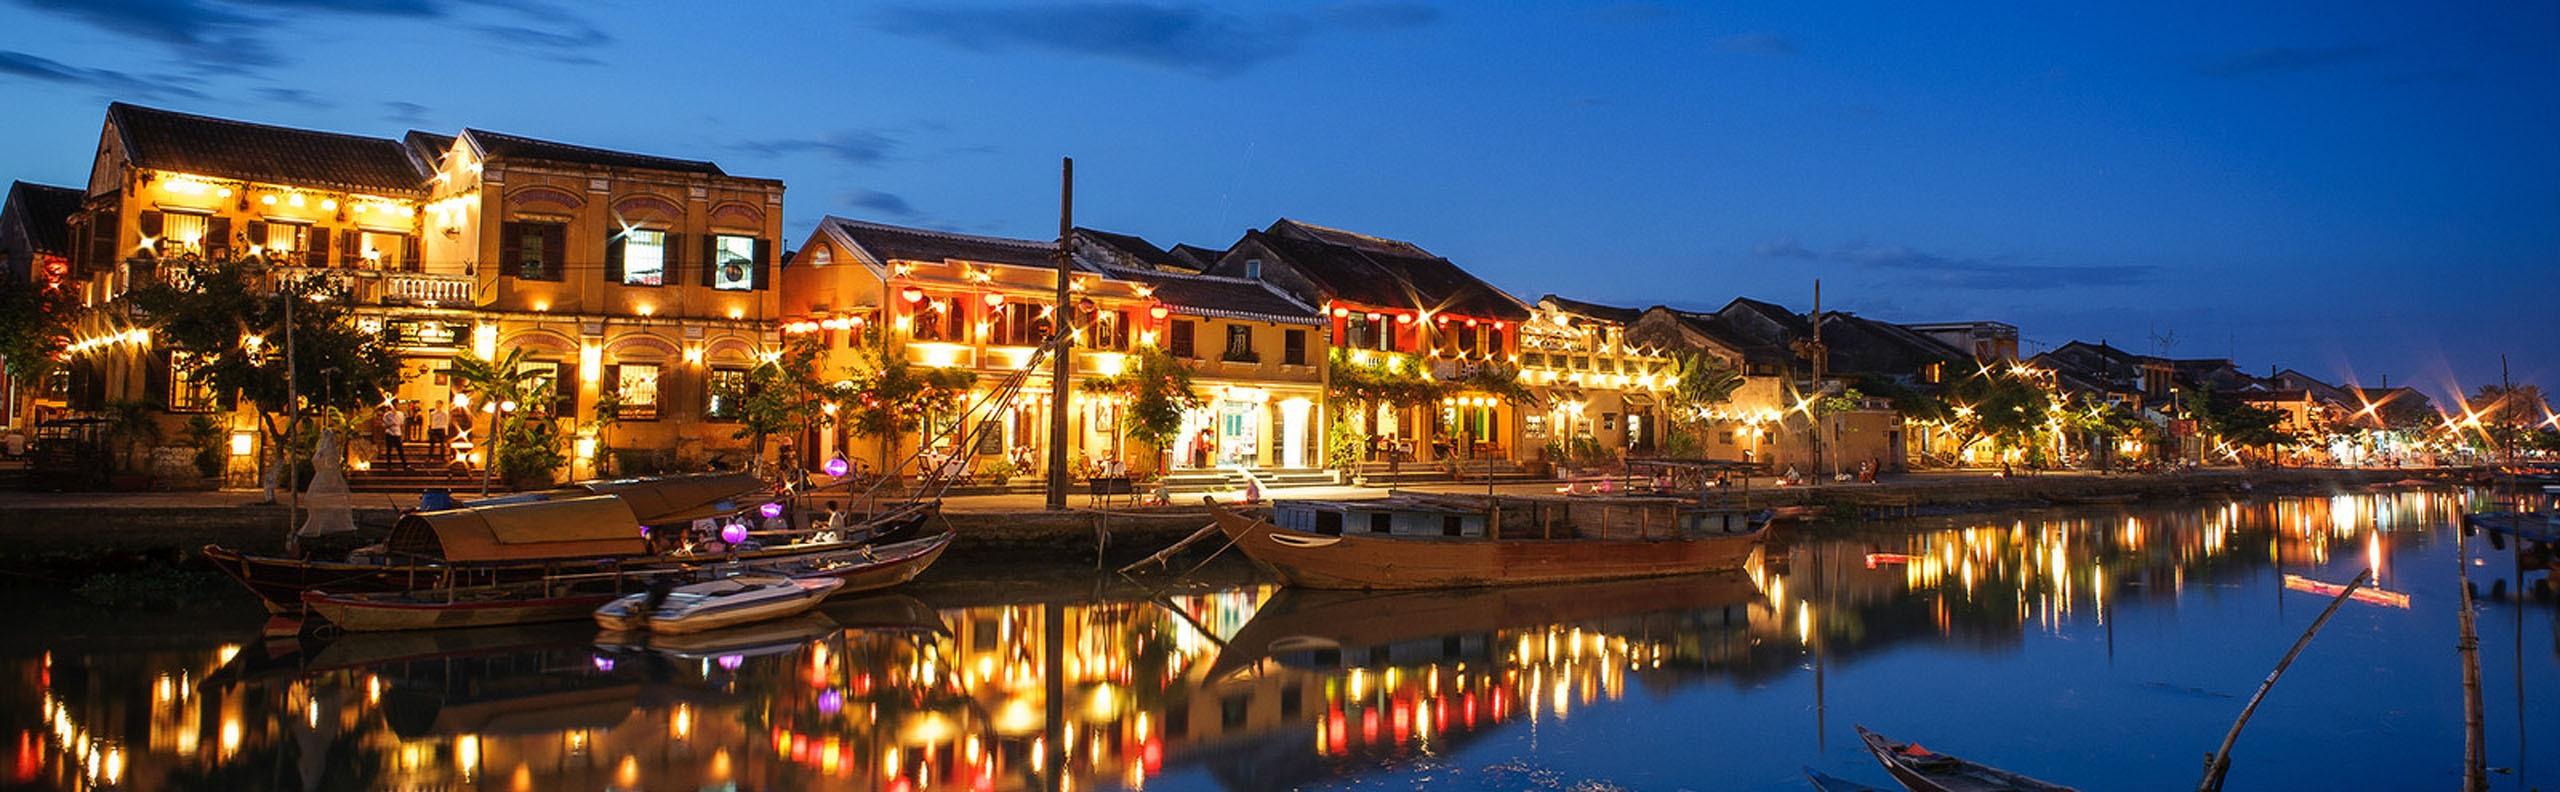 Nightlife in Hoi An - Diverse Nightlife Experiences